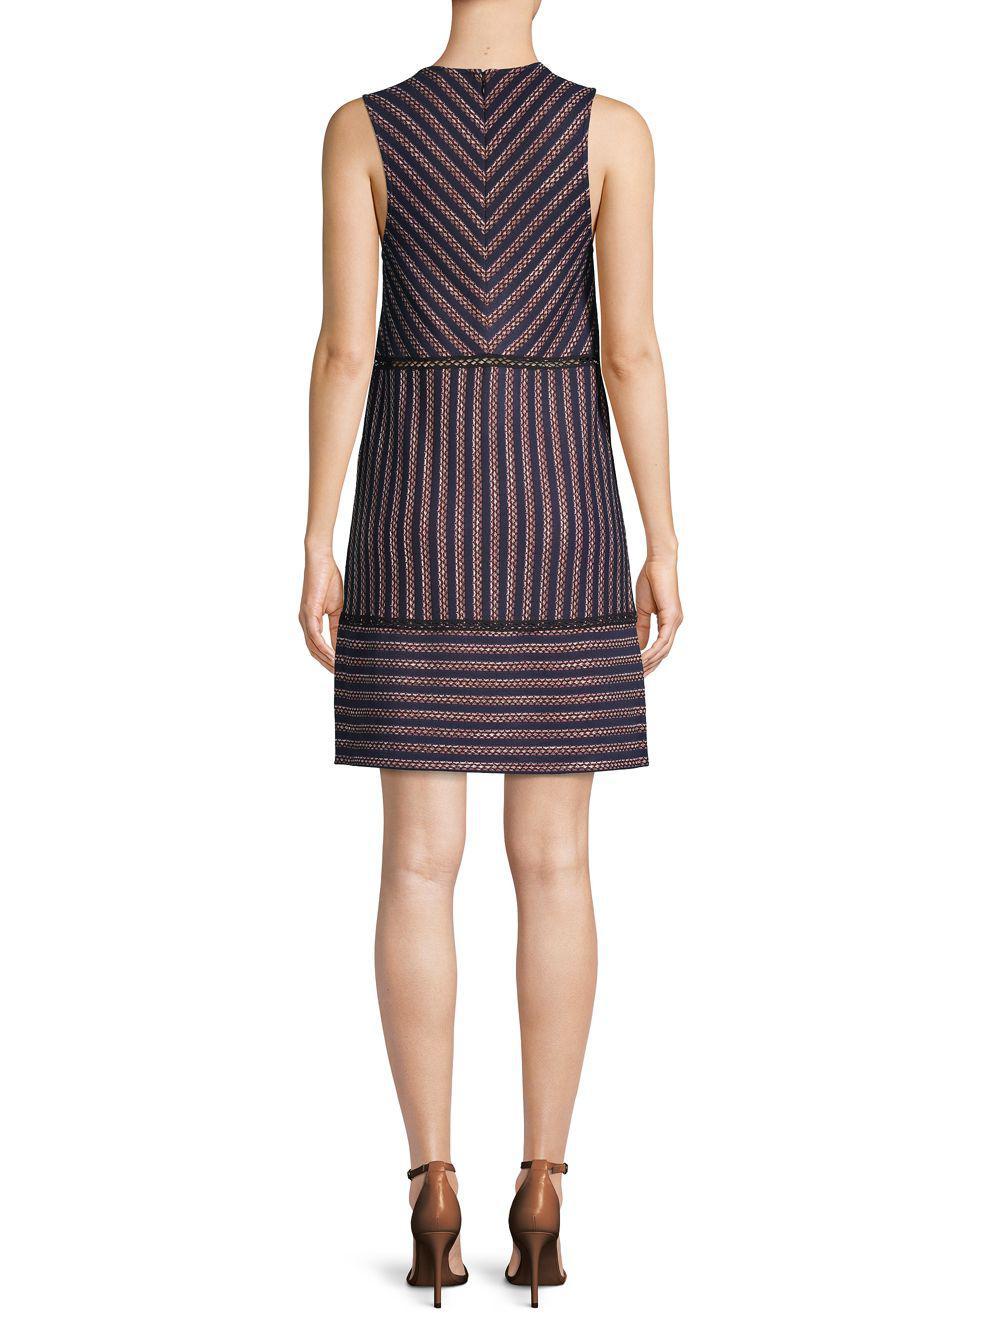 faba4ac88a BCBGMAXAZRIA - Blue Striped Lace Shift Dress - Lyst. View fullscreen